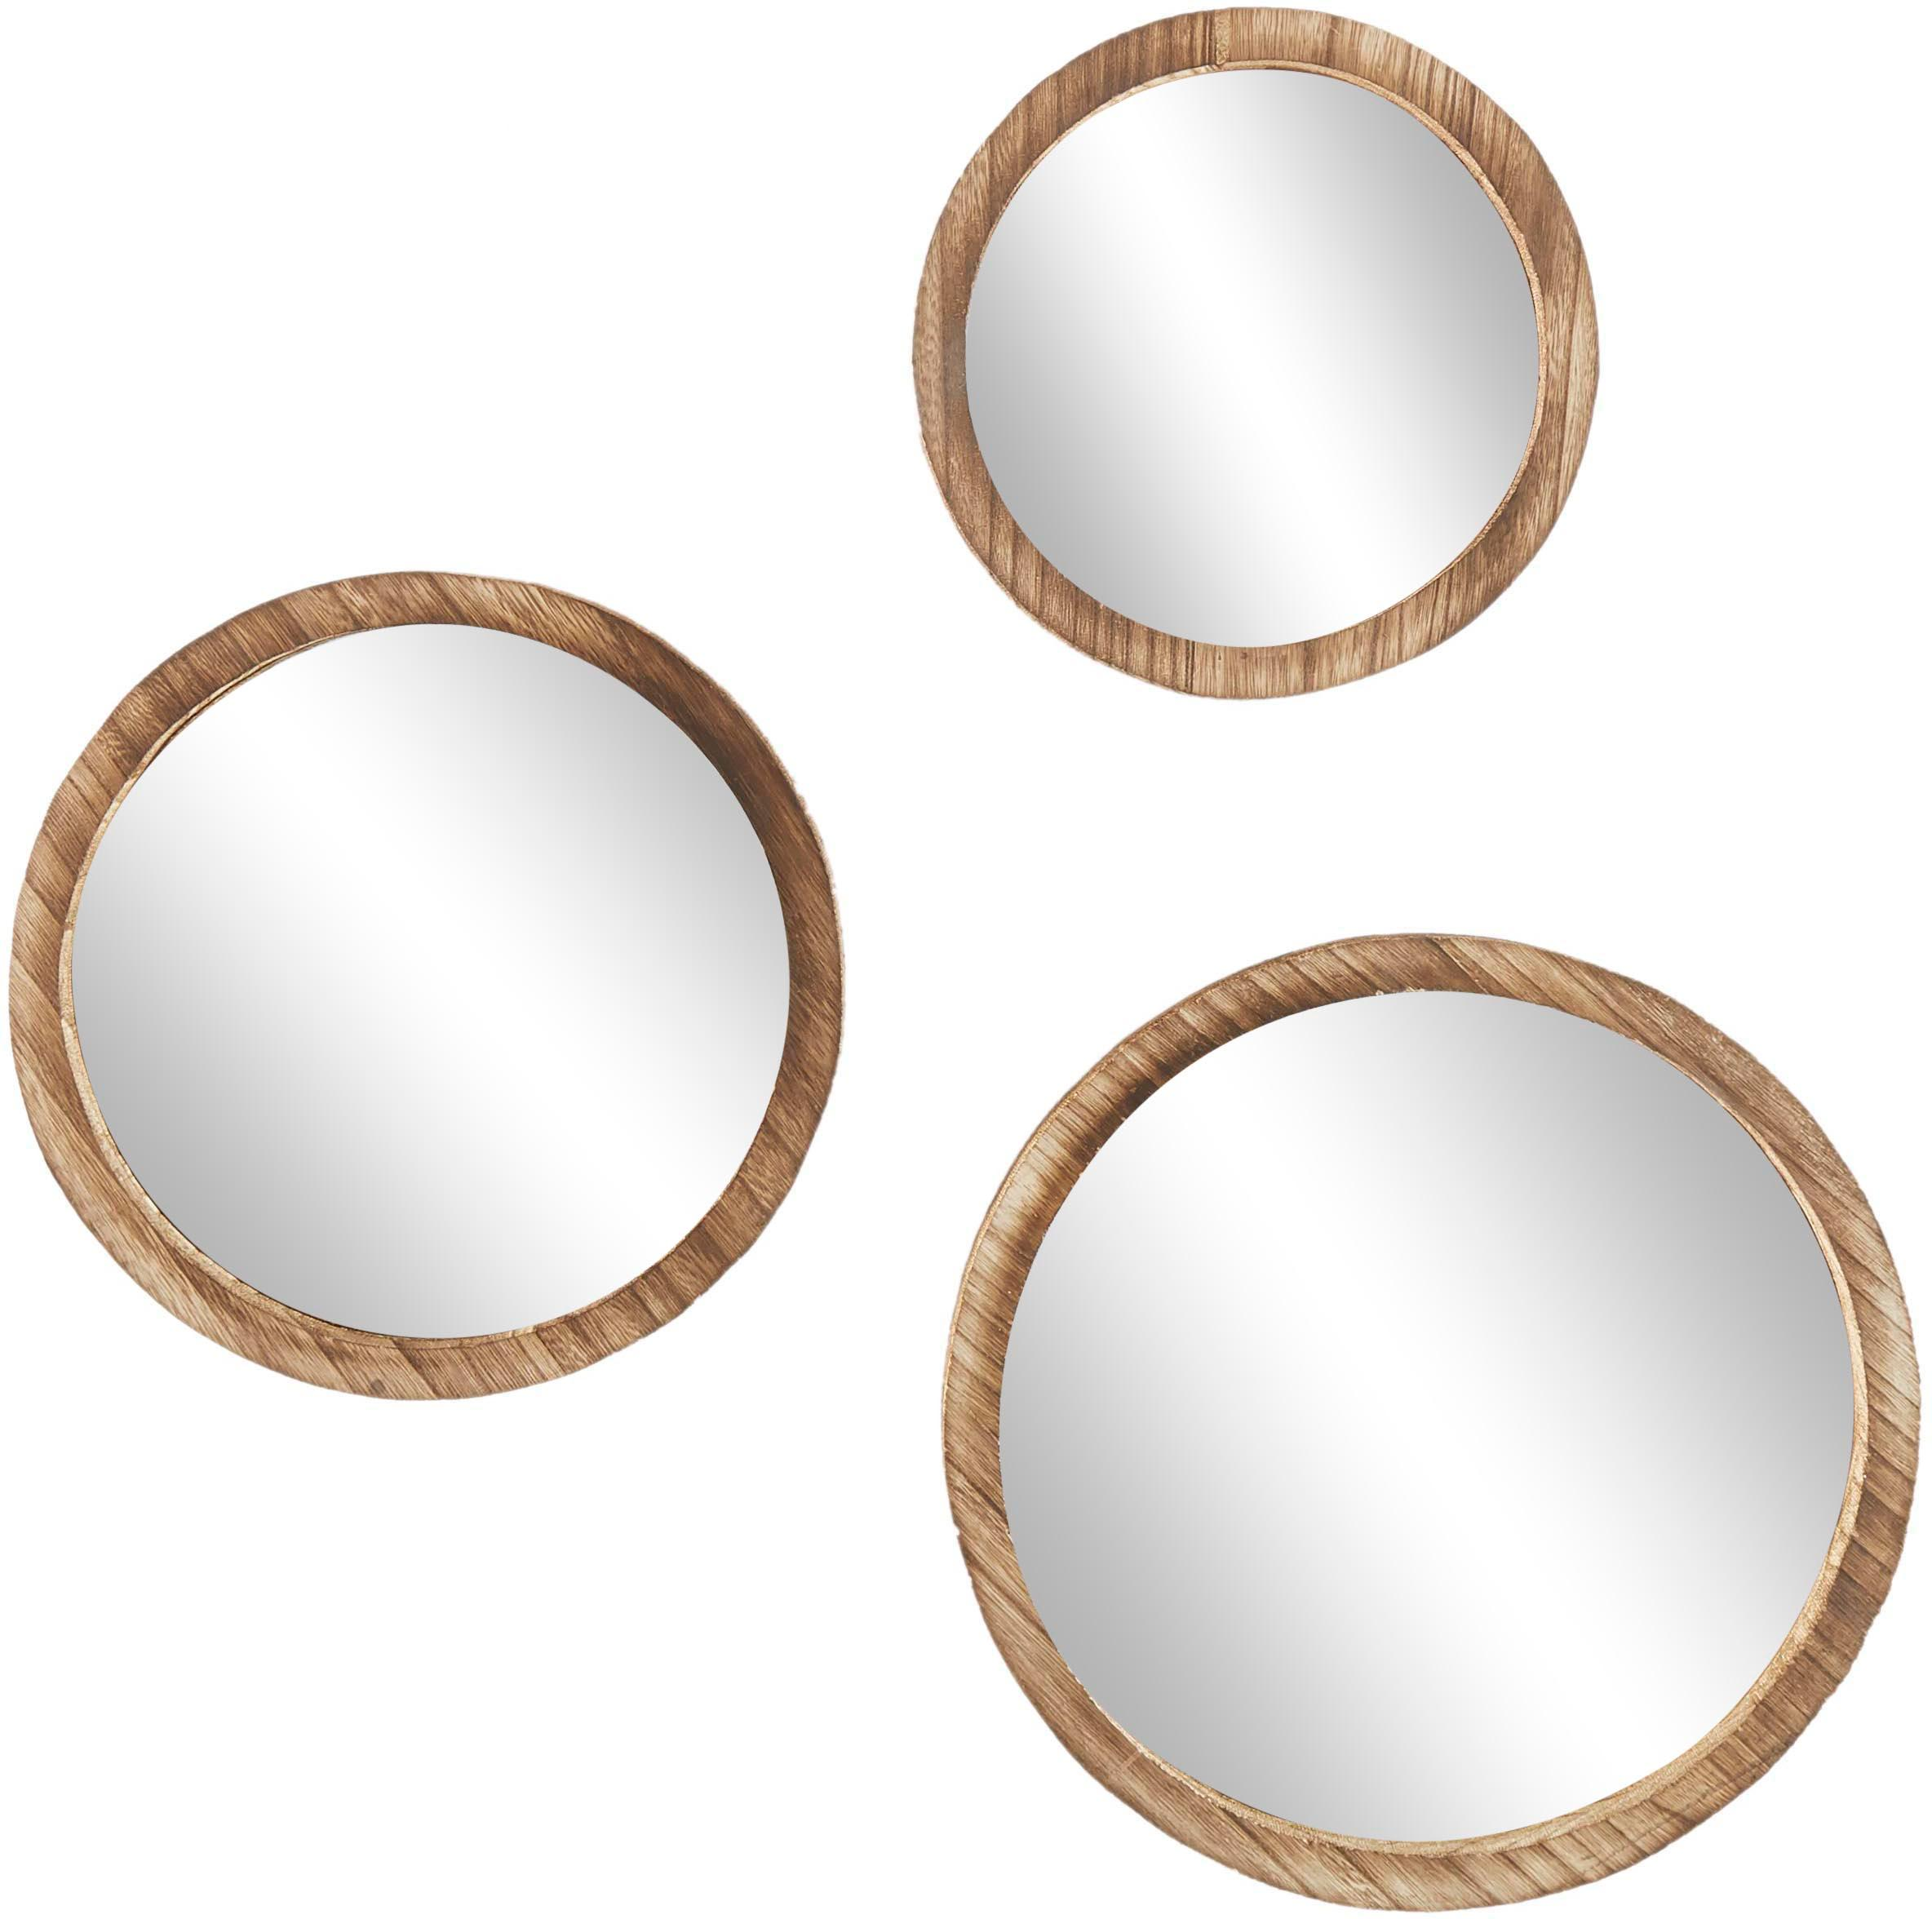 Wandspiegel-Set Jones mit Paulowniaholz-Rahmen, 3-tlg., Rahmen: Paulowniaholz, Spiegelfläche: Spiegelglas, Braun, Sondergrößen